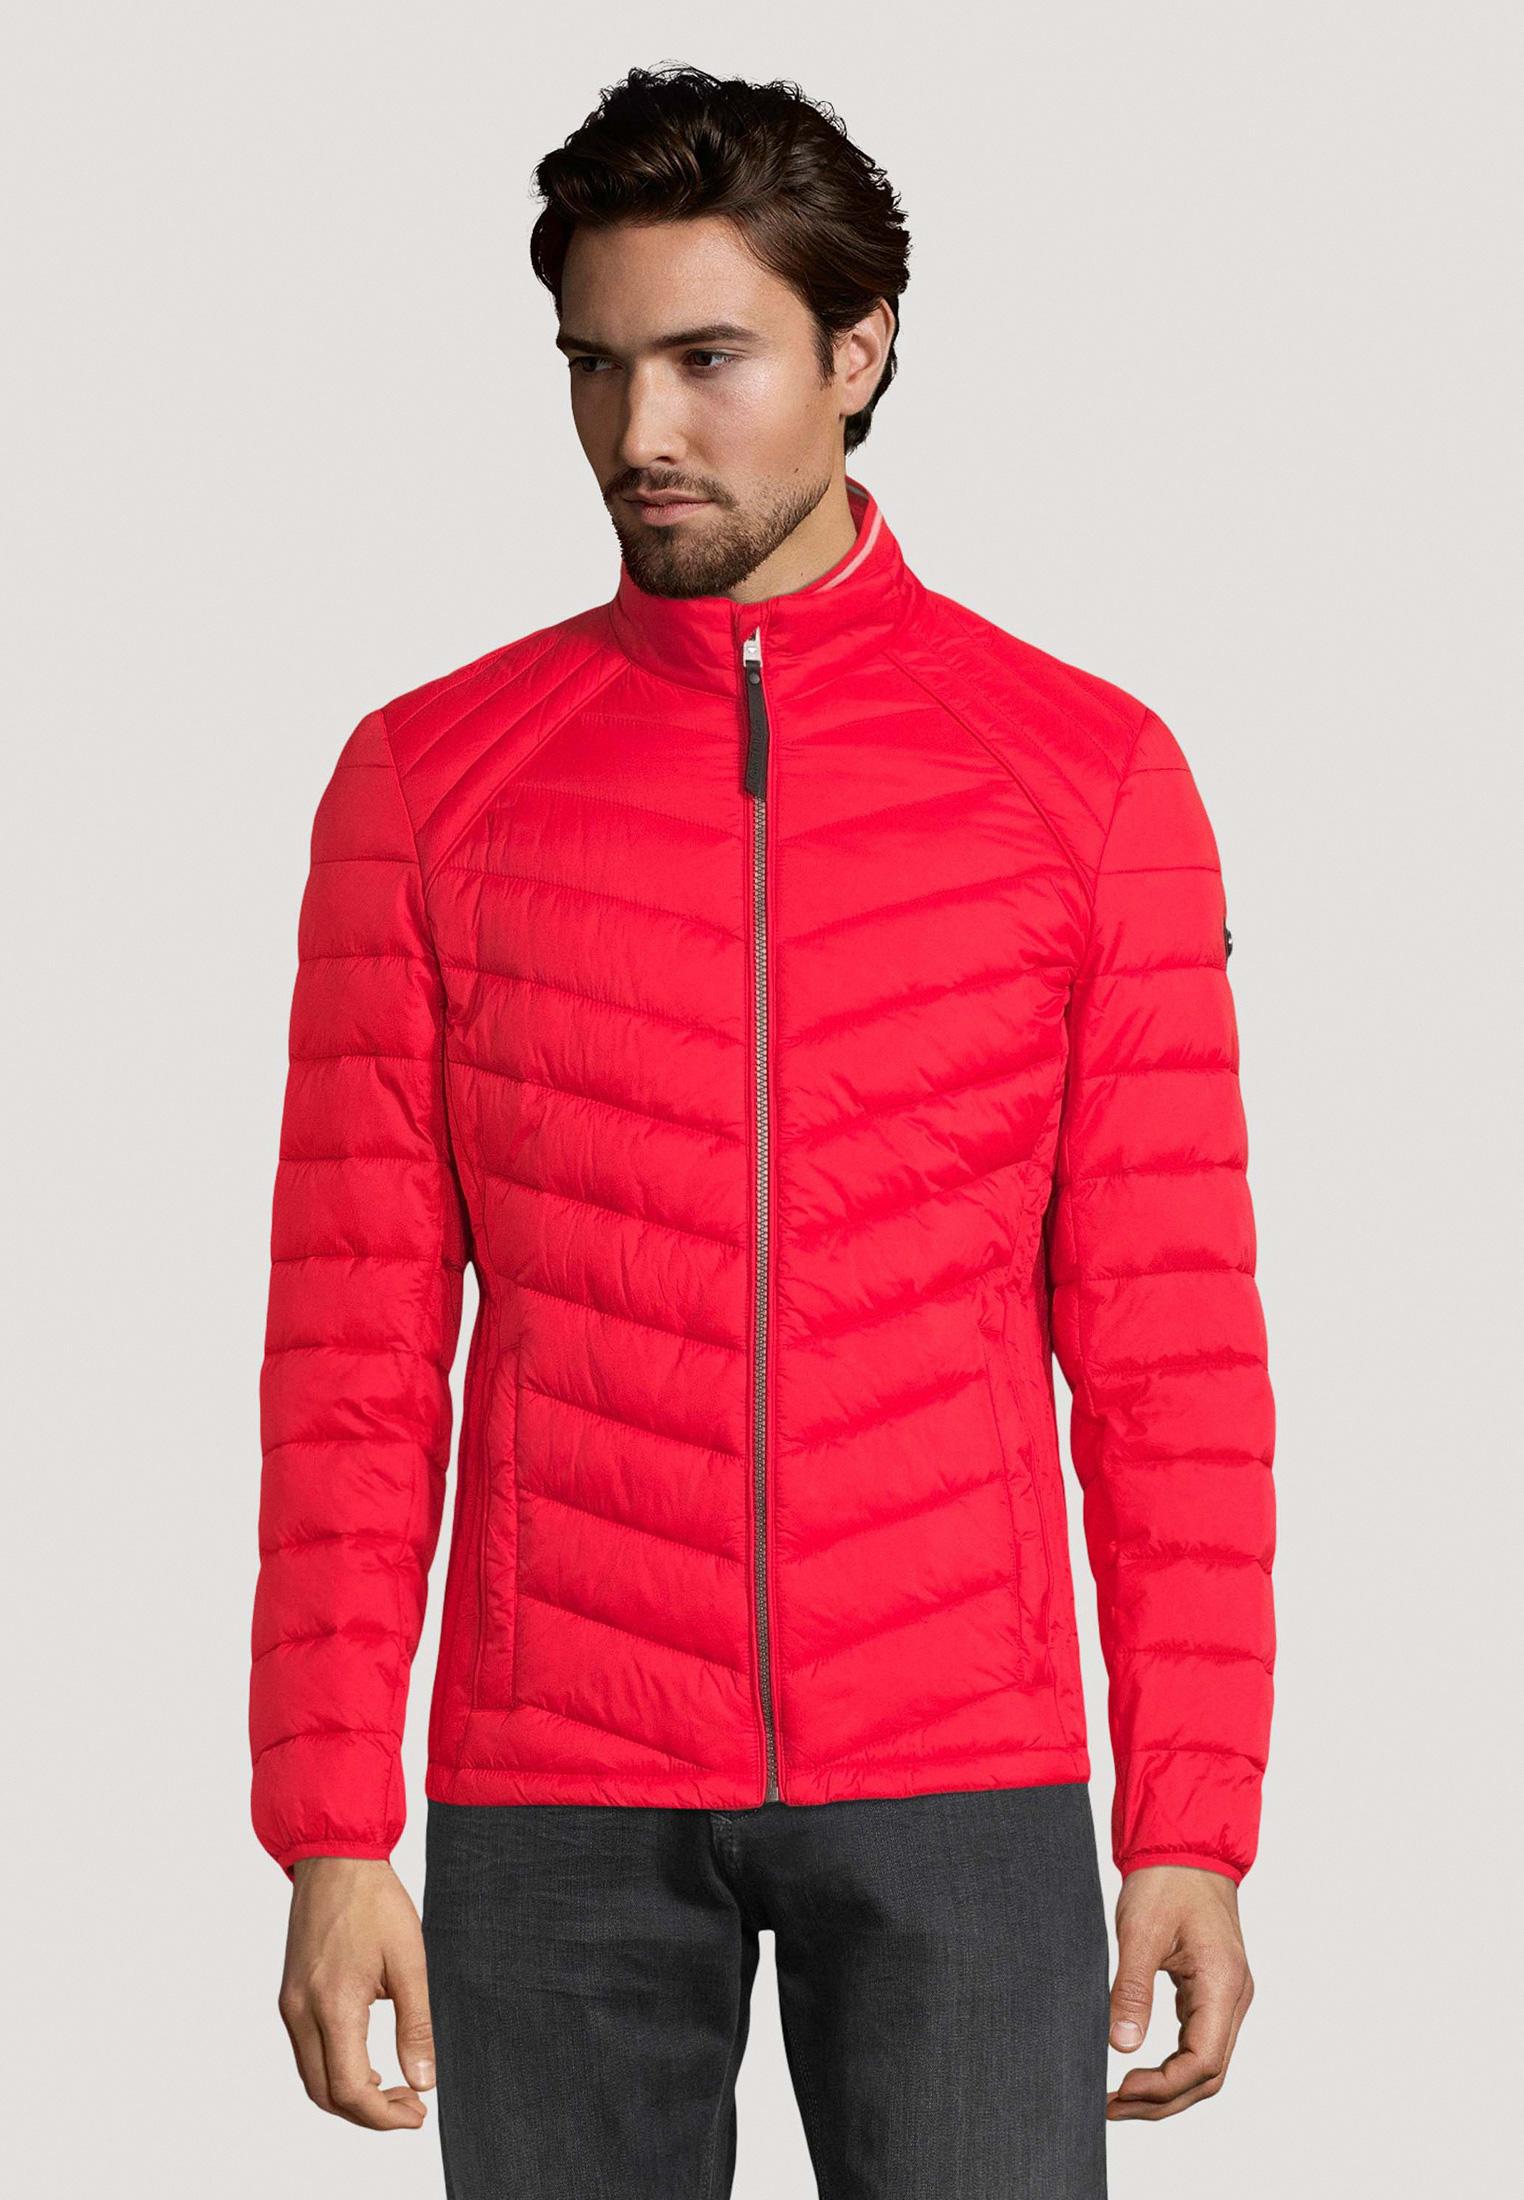 Утепленная куртка Tom Tailor (Том Тейлор) Куртка утепленная Tom Tailor